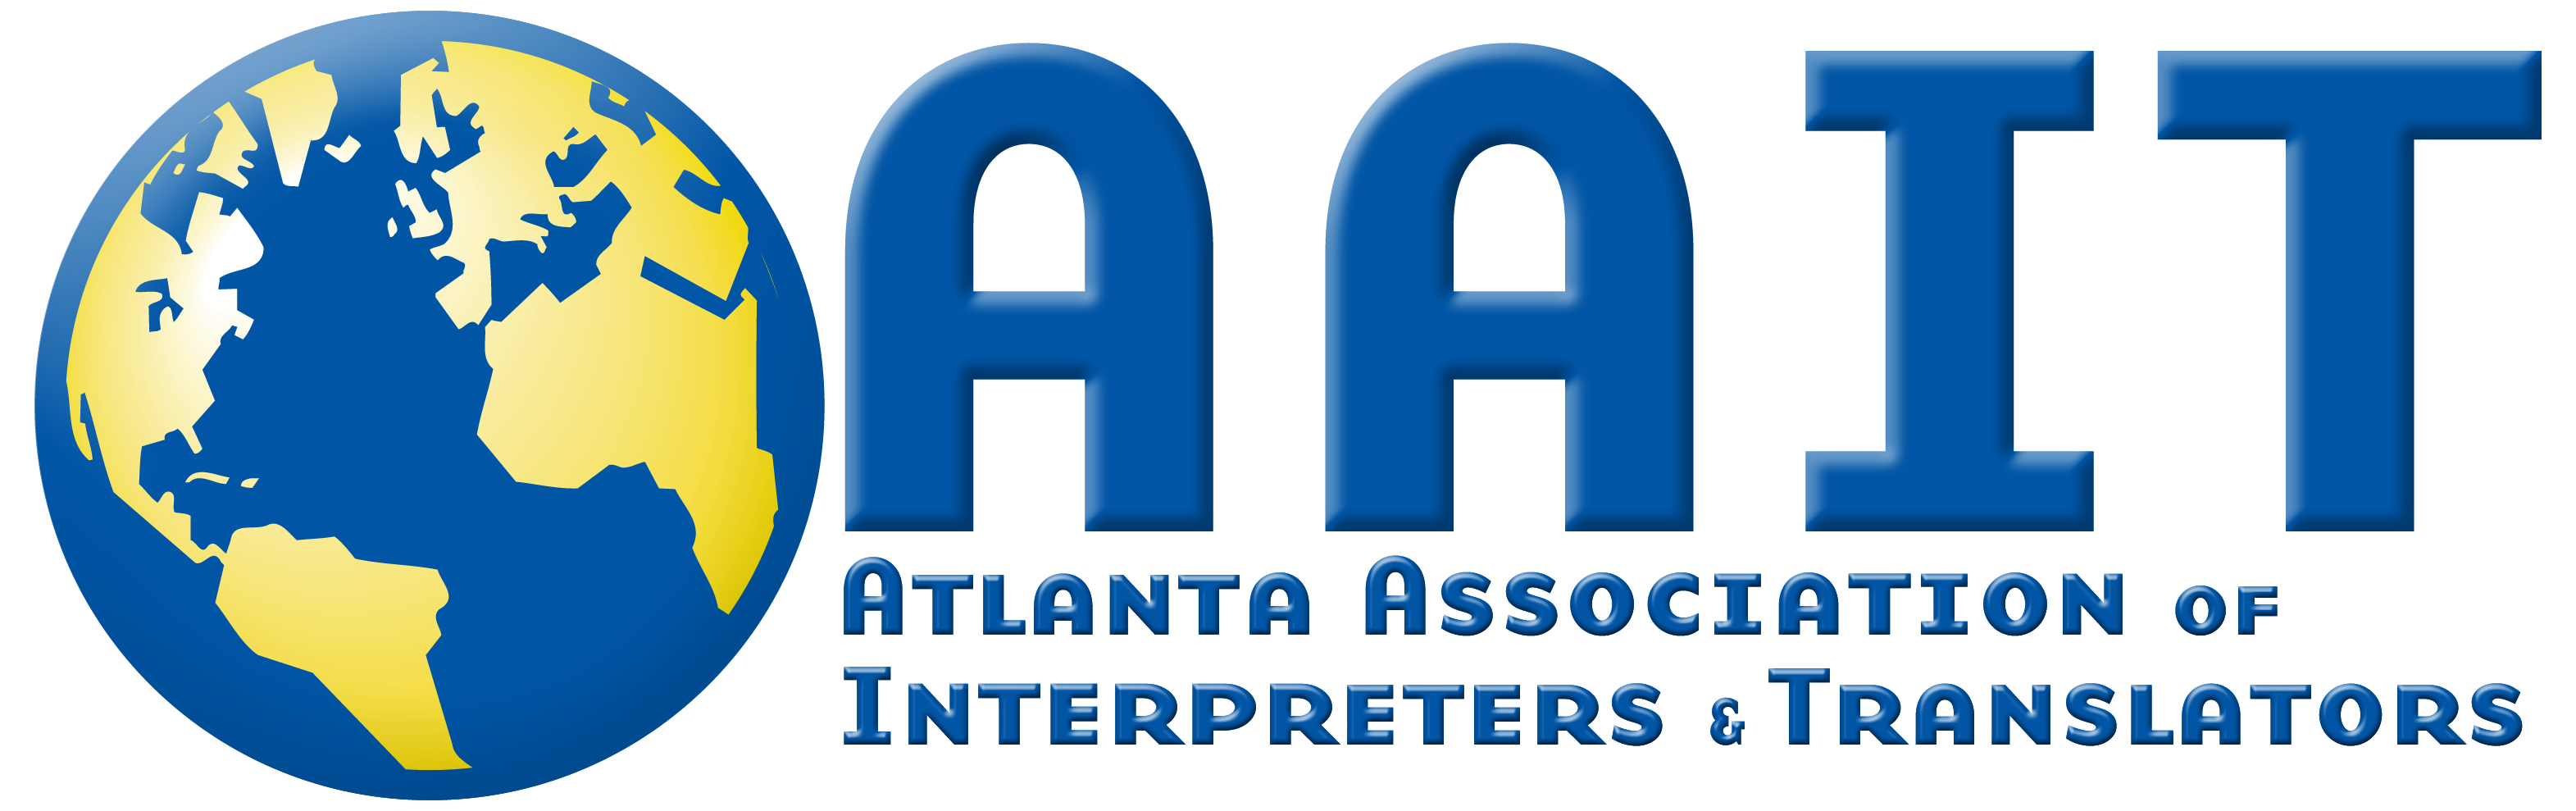 AAIT Directory